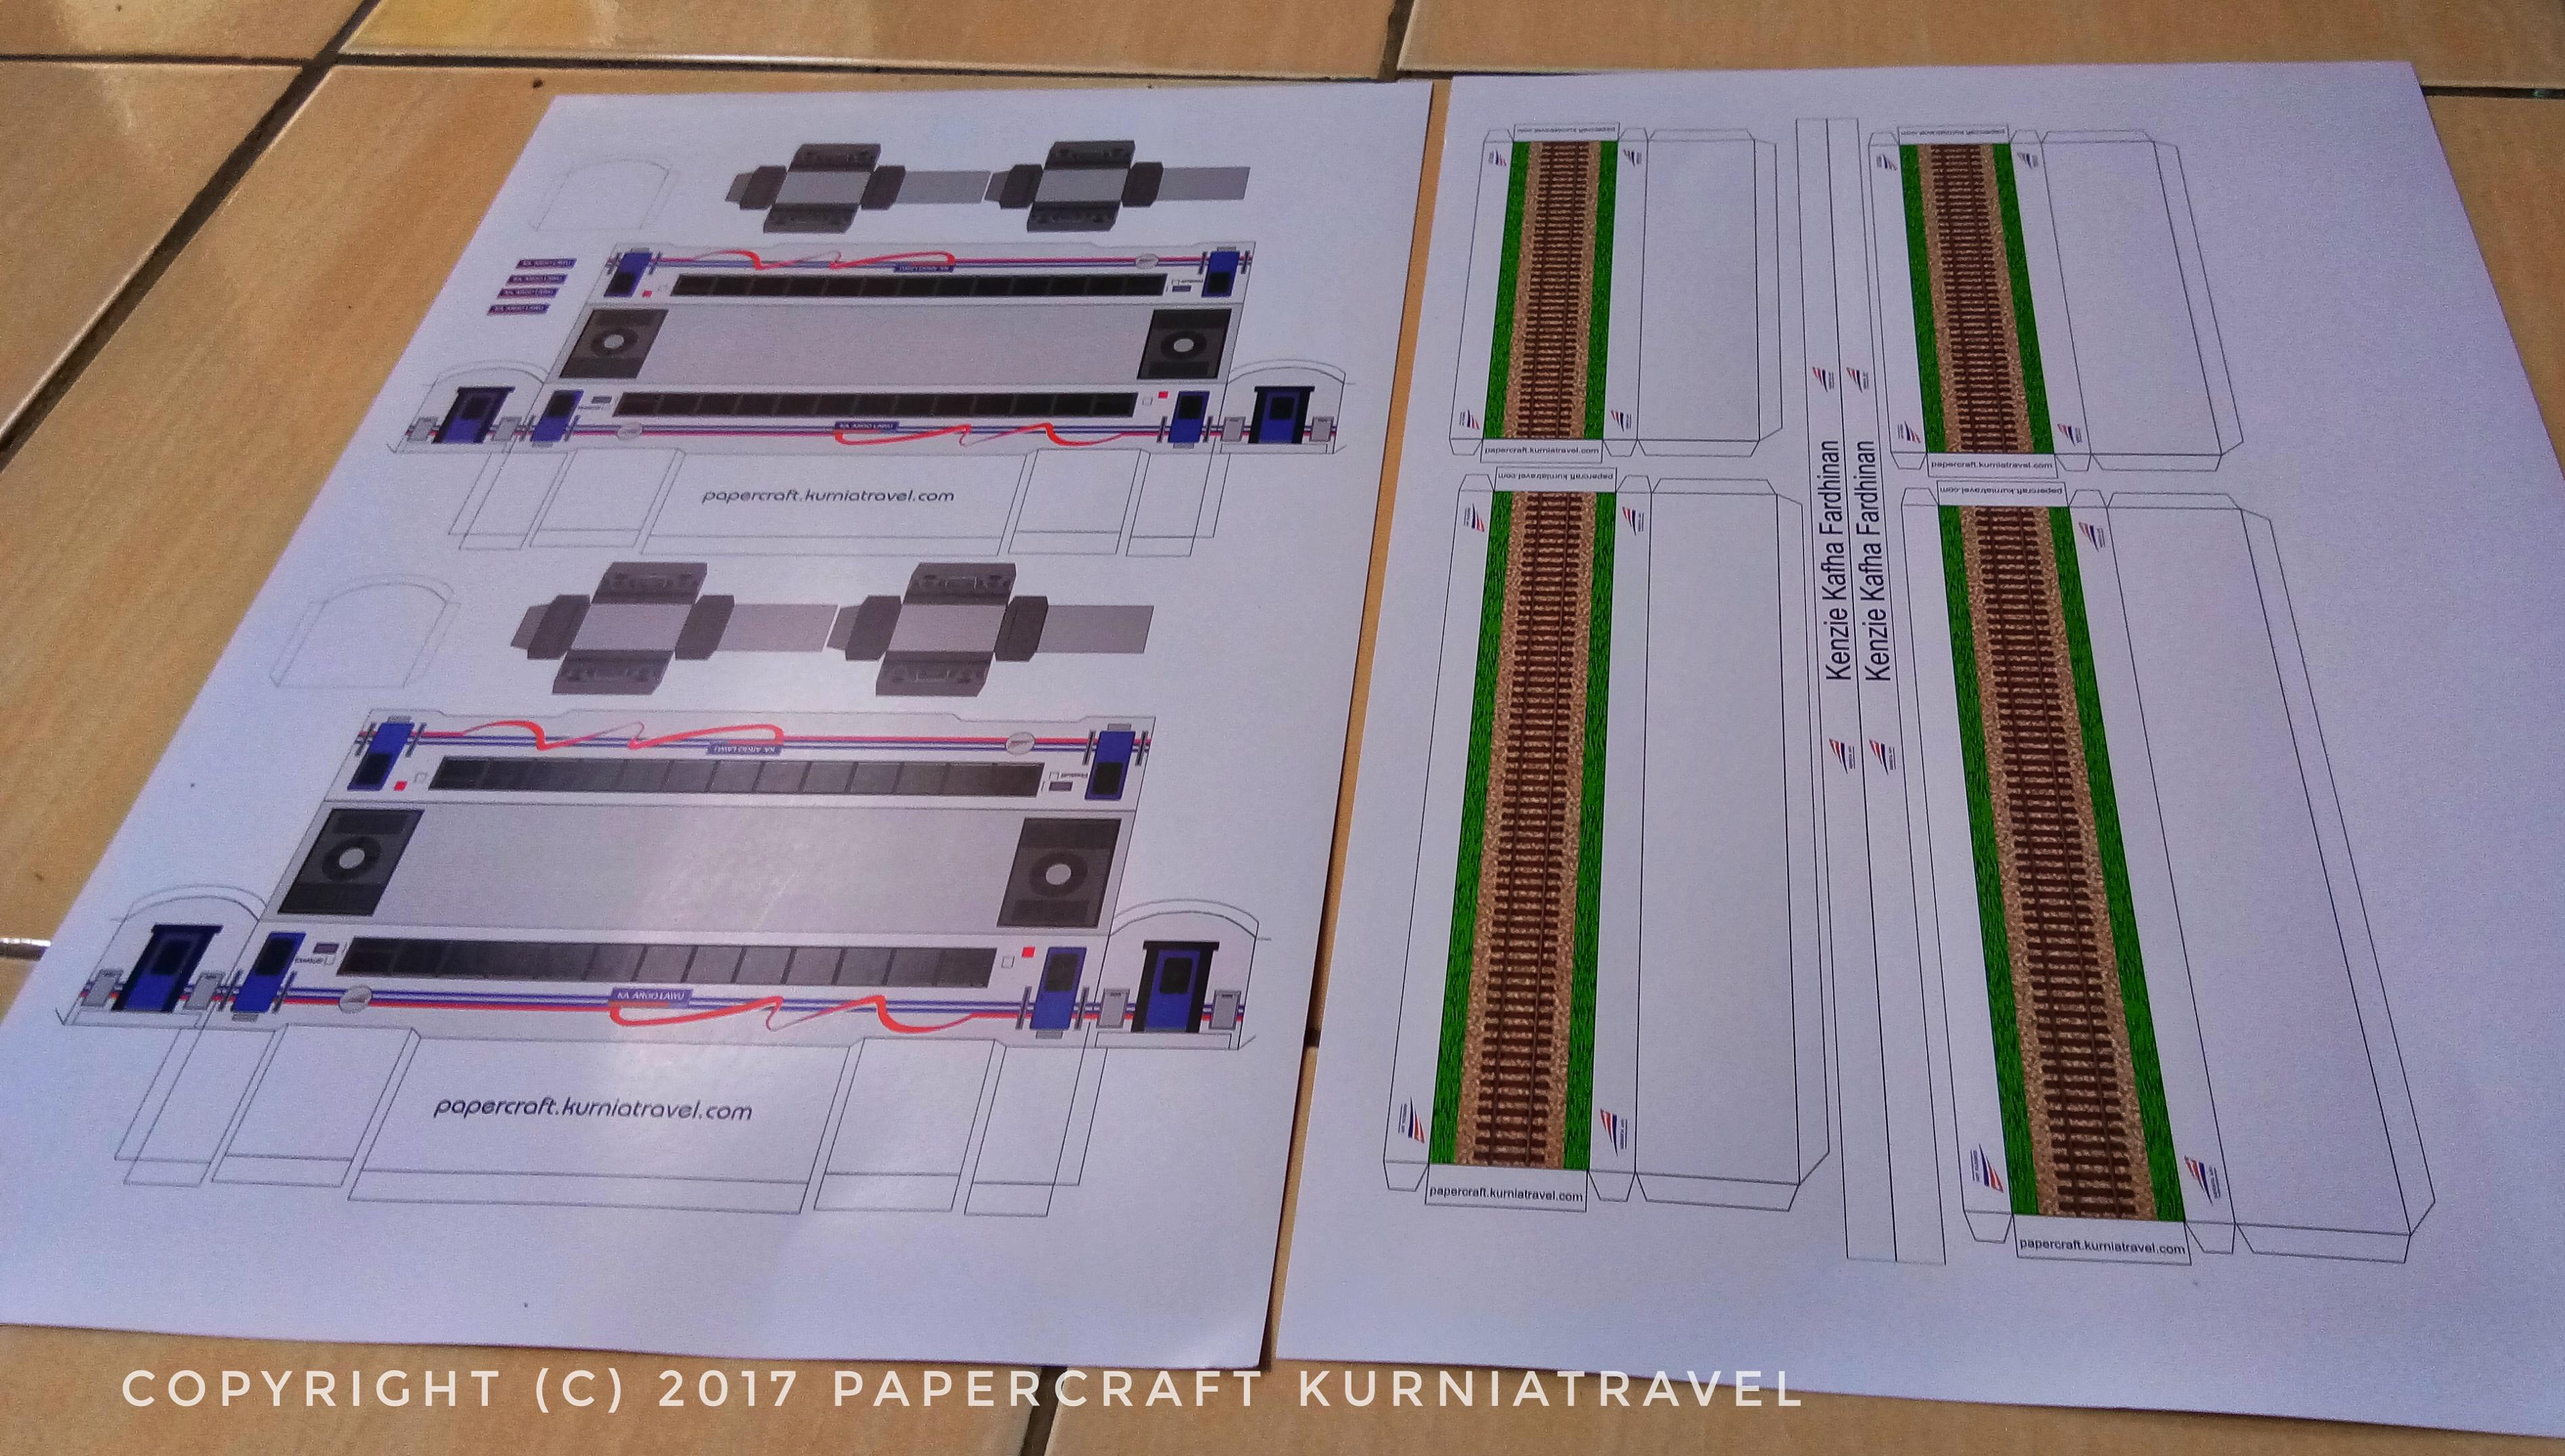 Pola Papercraft Kereta Argo Lawu-Papercraft Kurniatravel